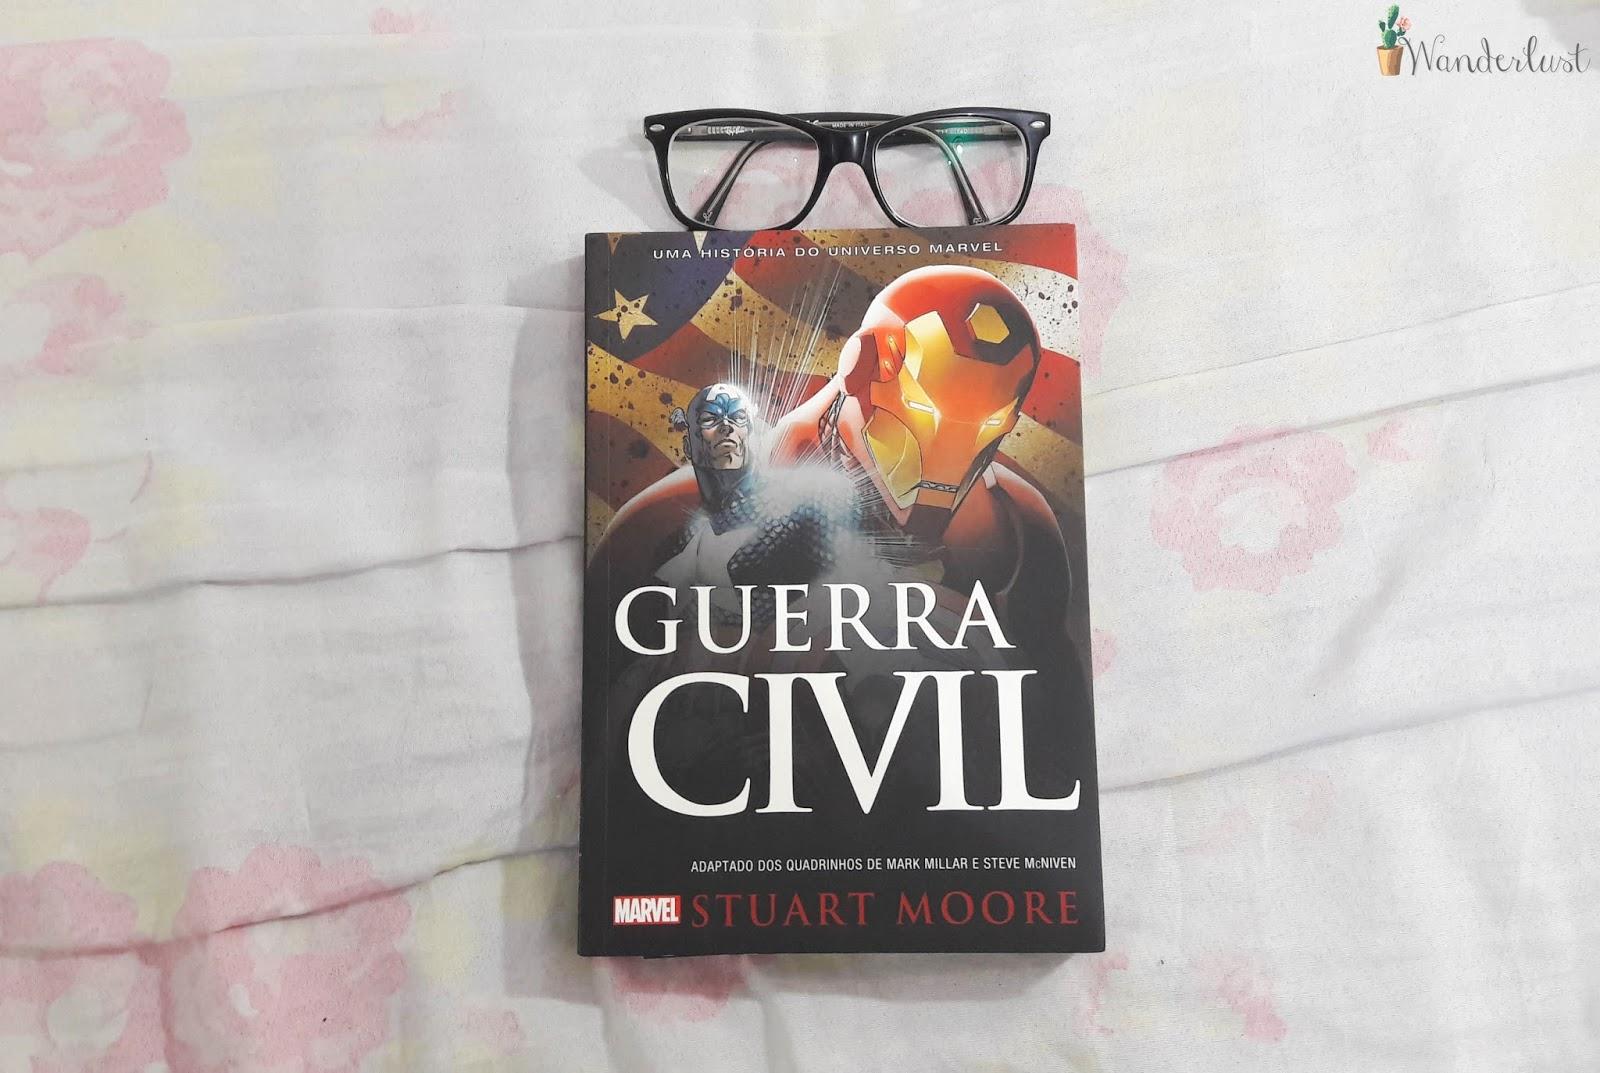 leituras, micaela ramos, livro, fotografia, guerra civil, nerd, marvel, stuart moore,